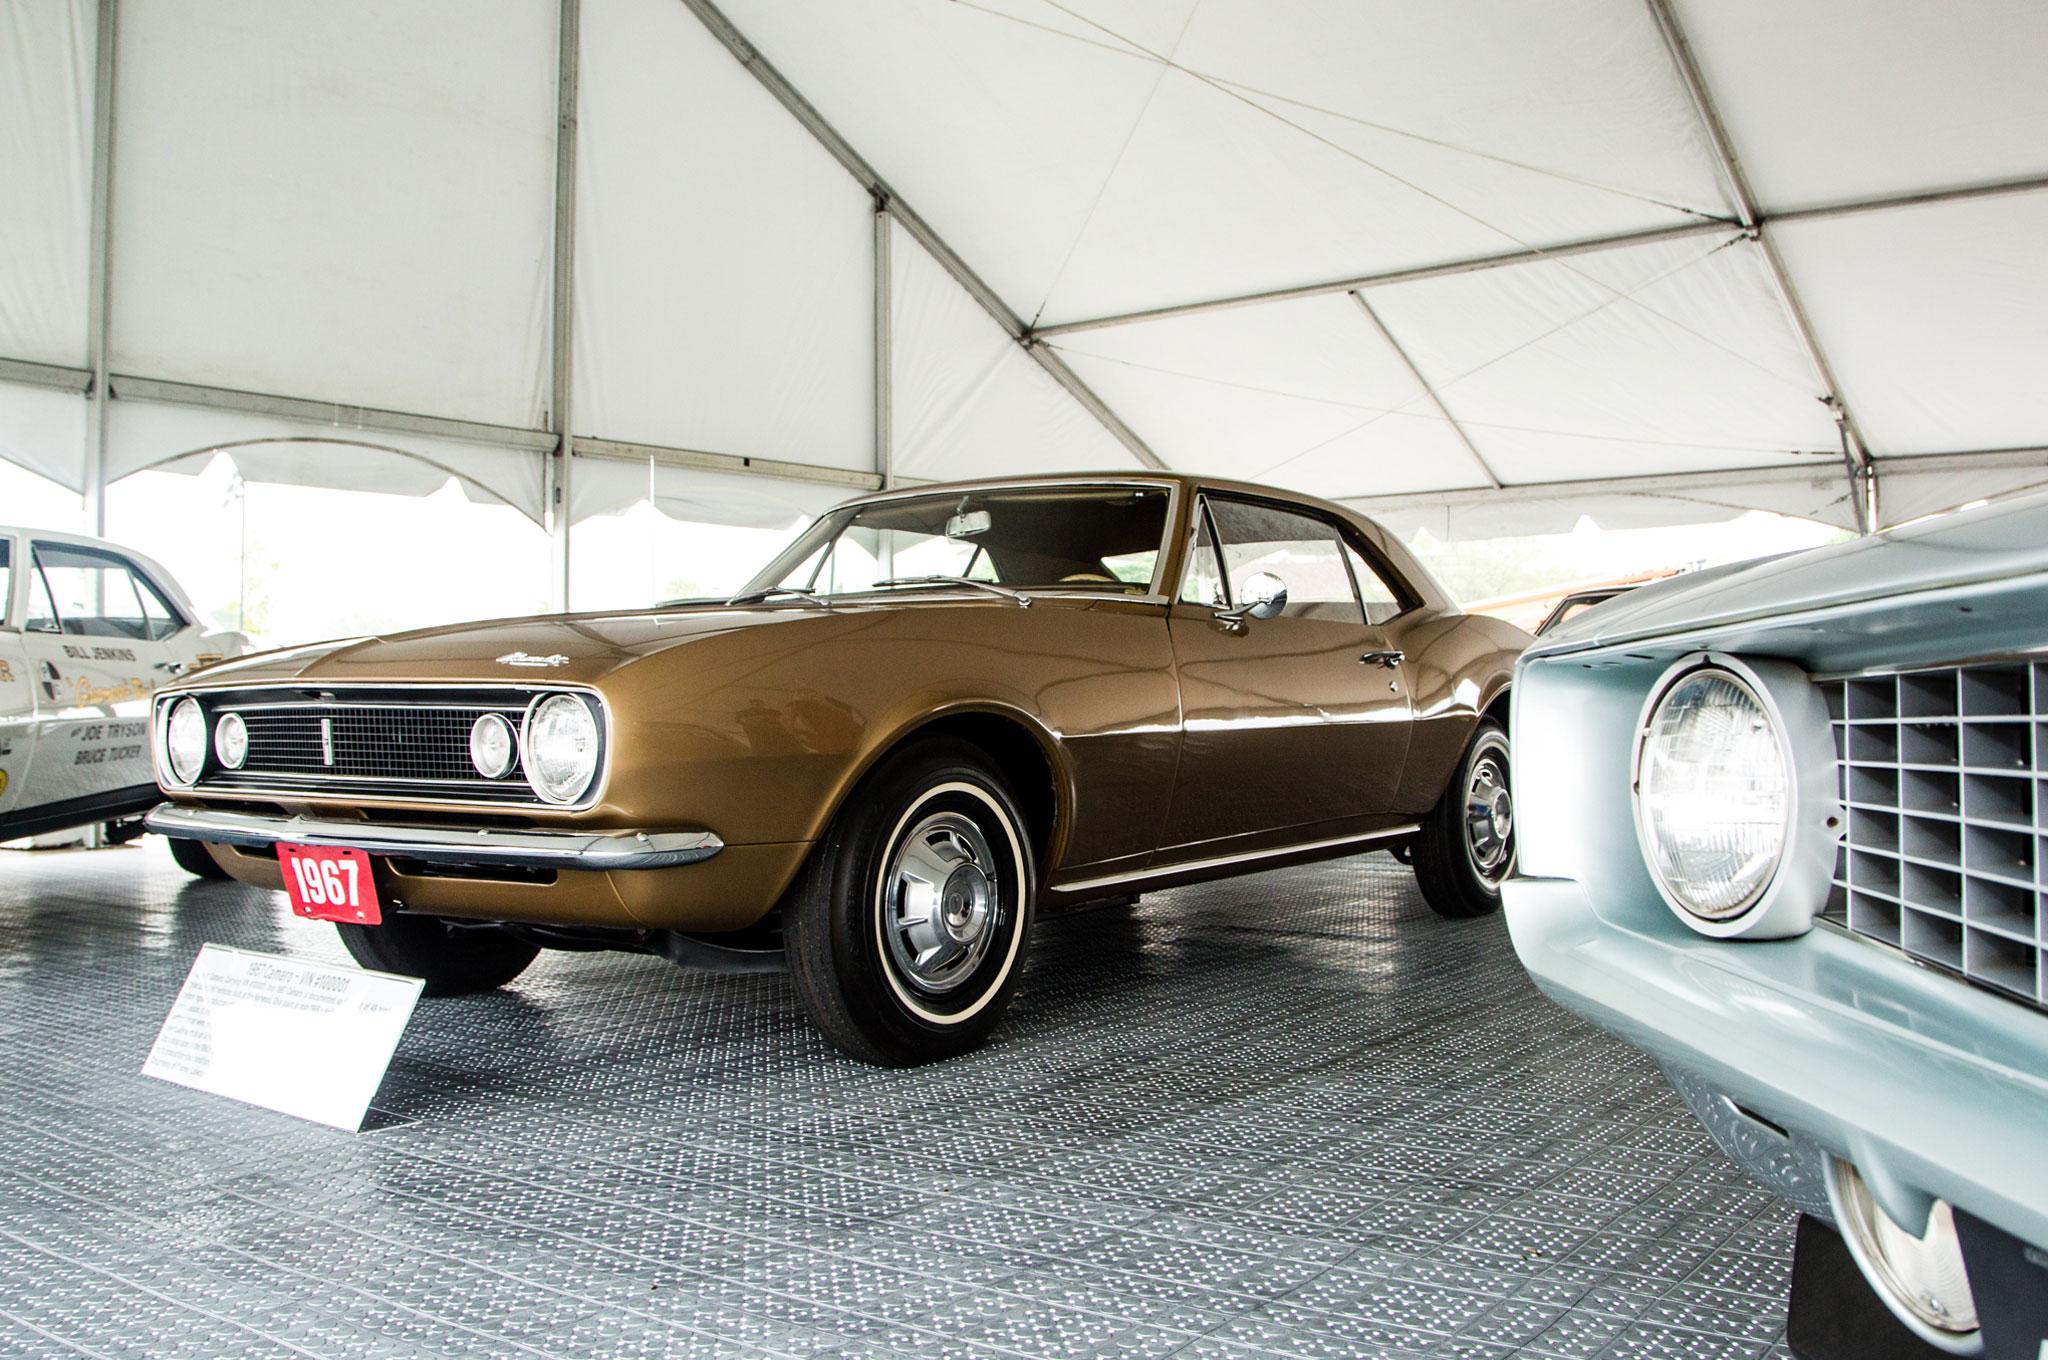 1967 Chevrolet Camaro VIN 1000001 1